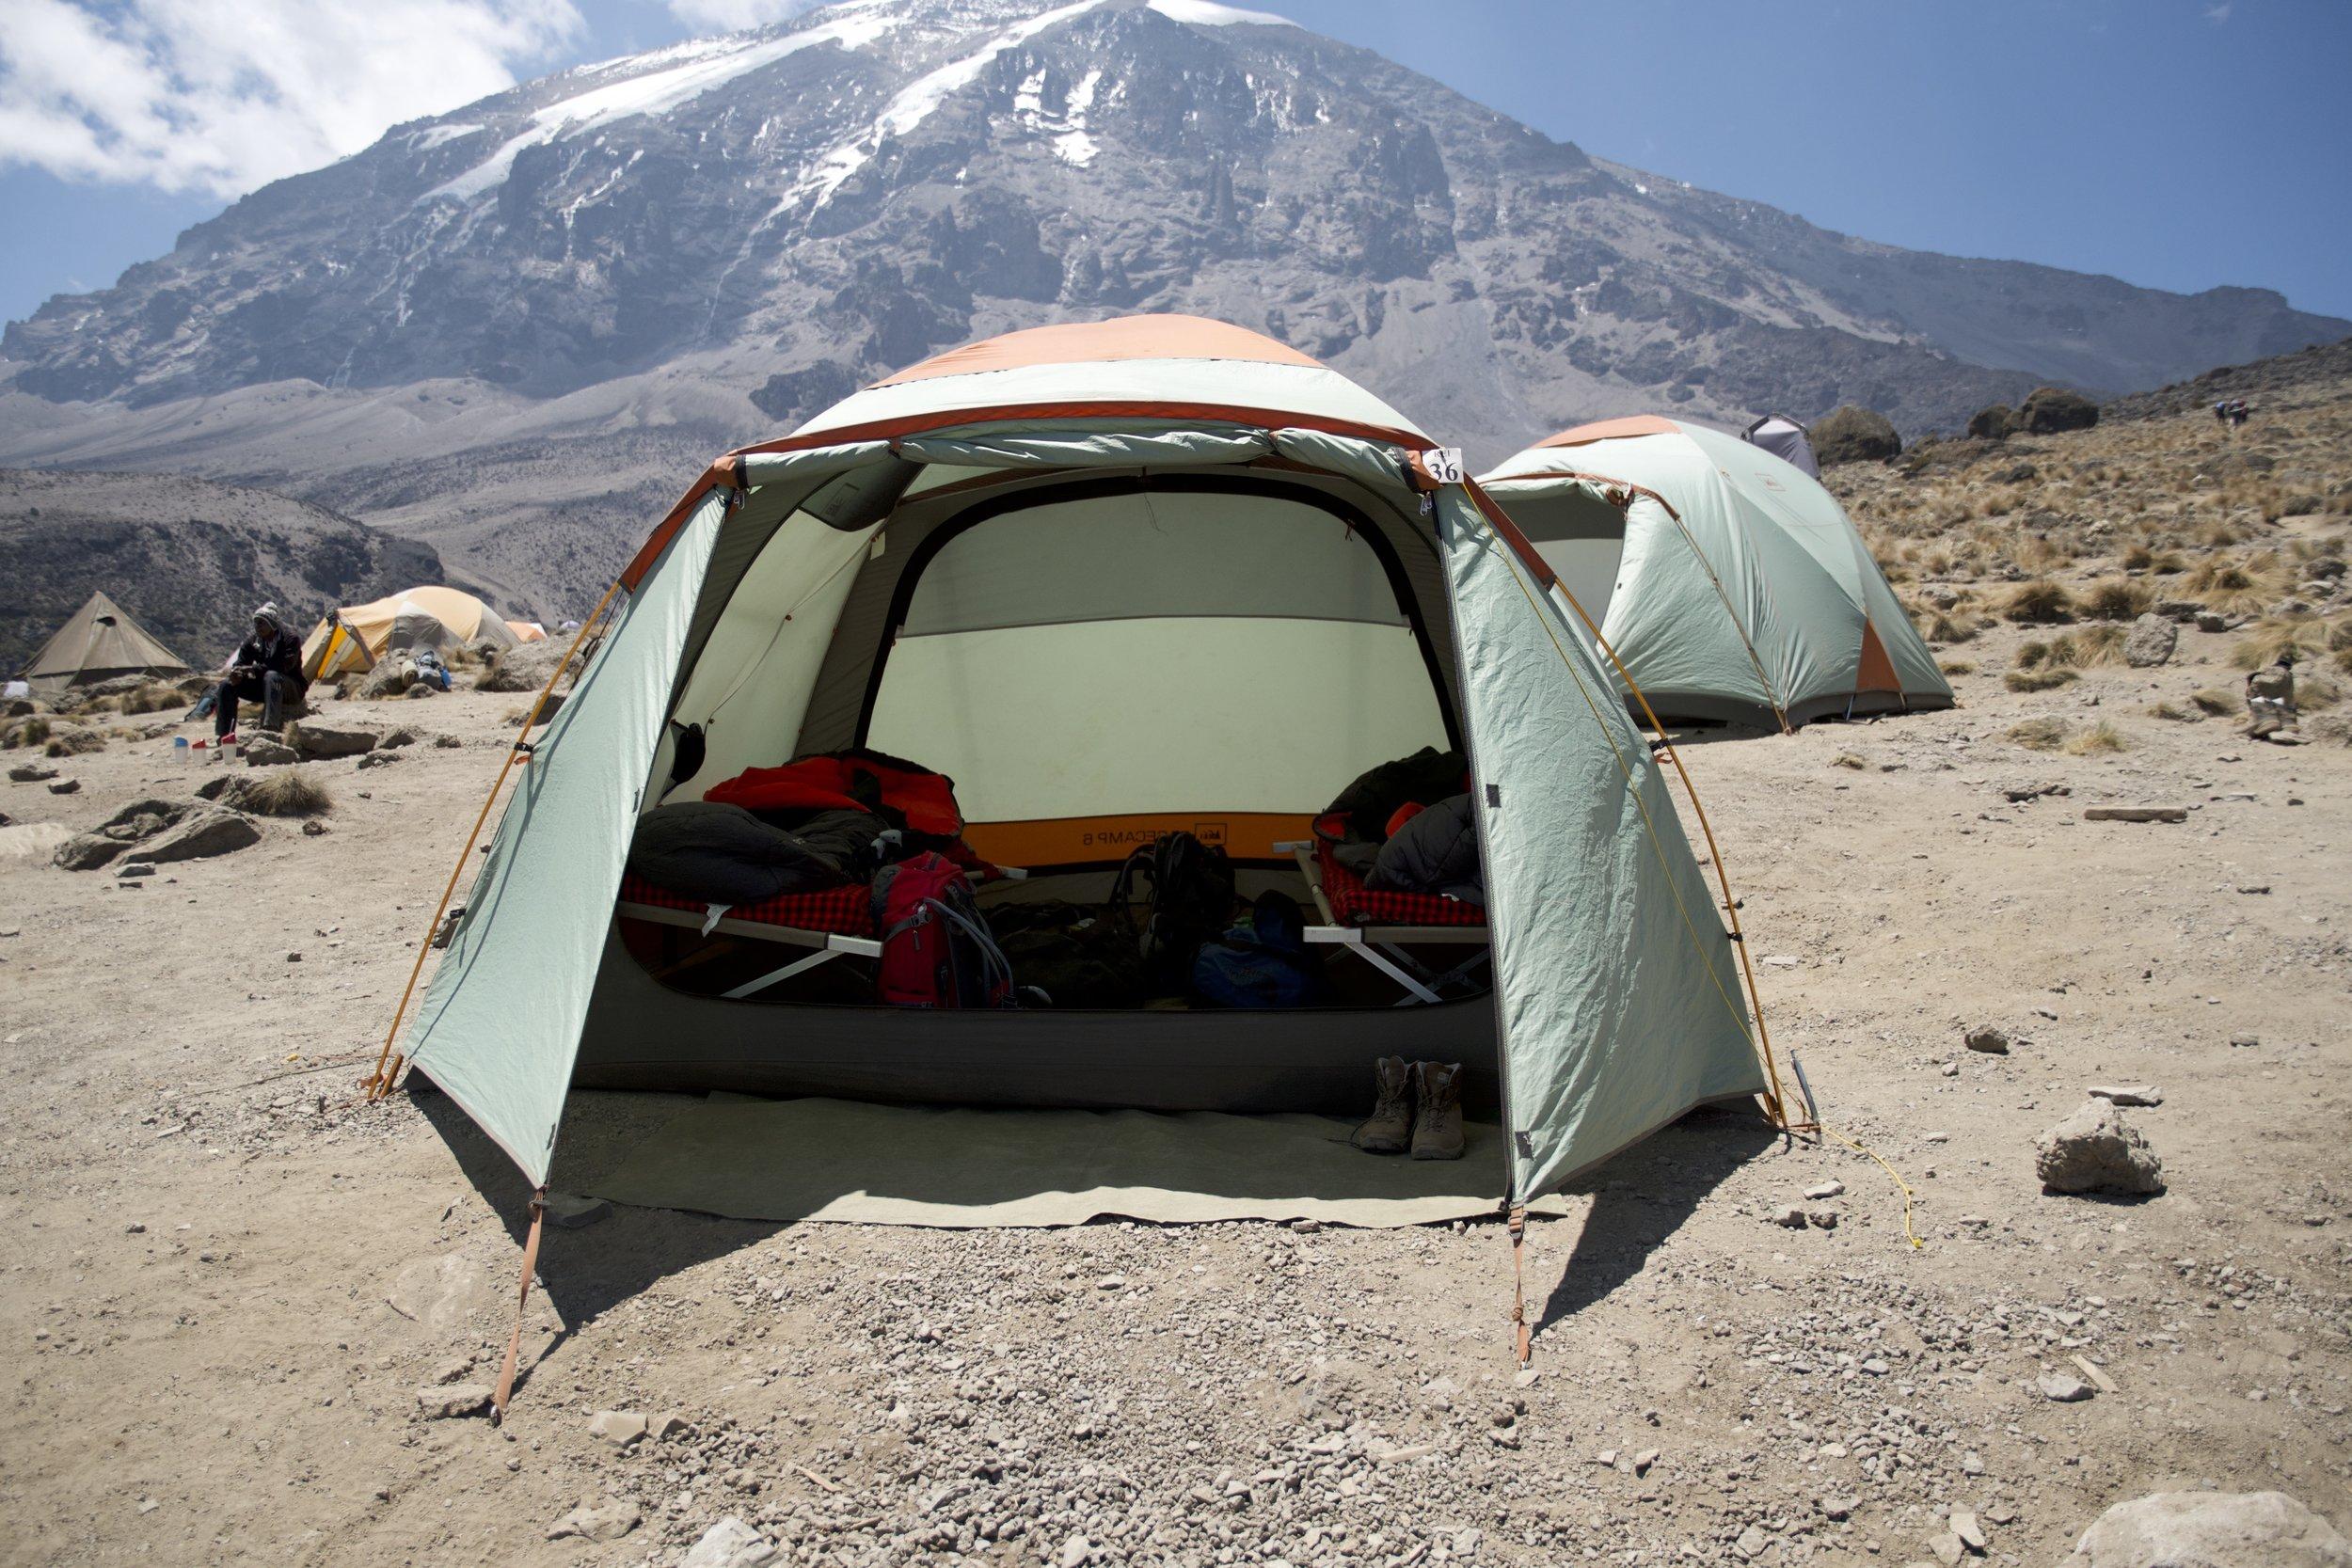 Day 6 / Karanga Camp VIP Walk in Tent